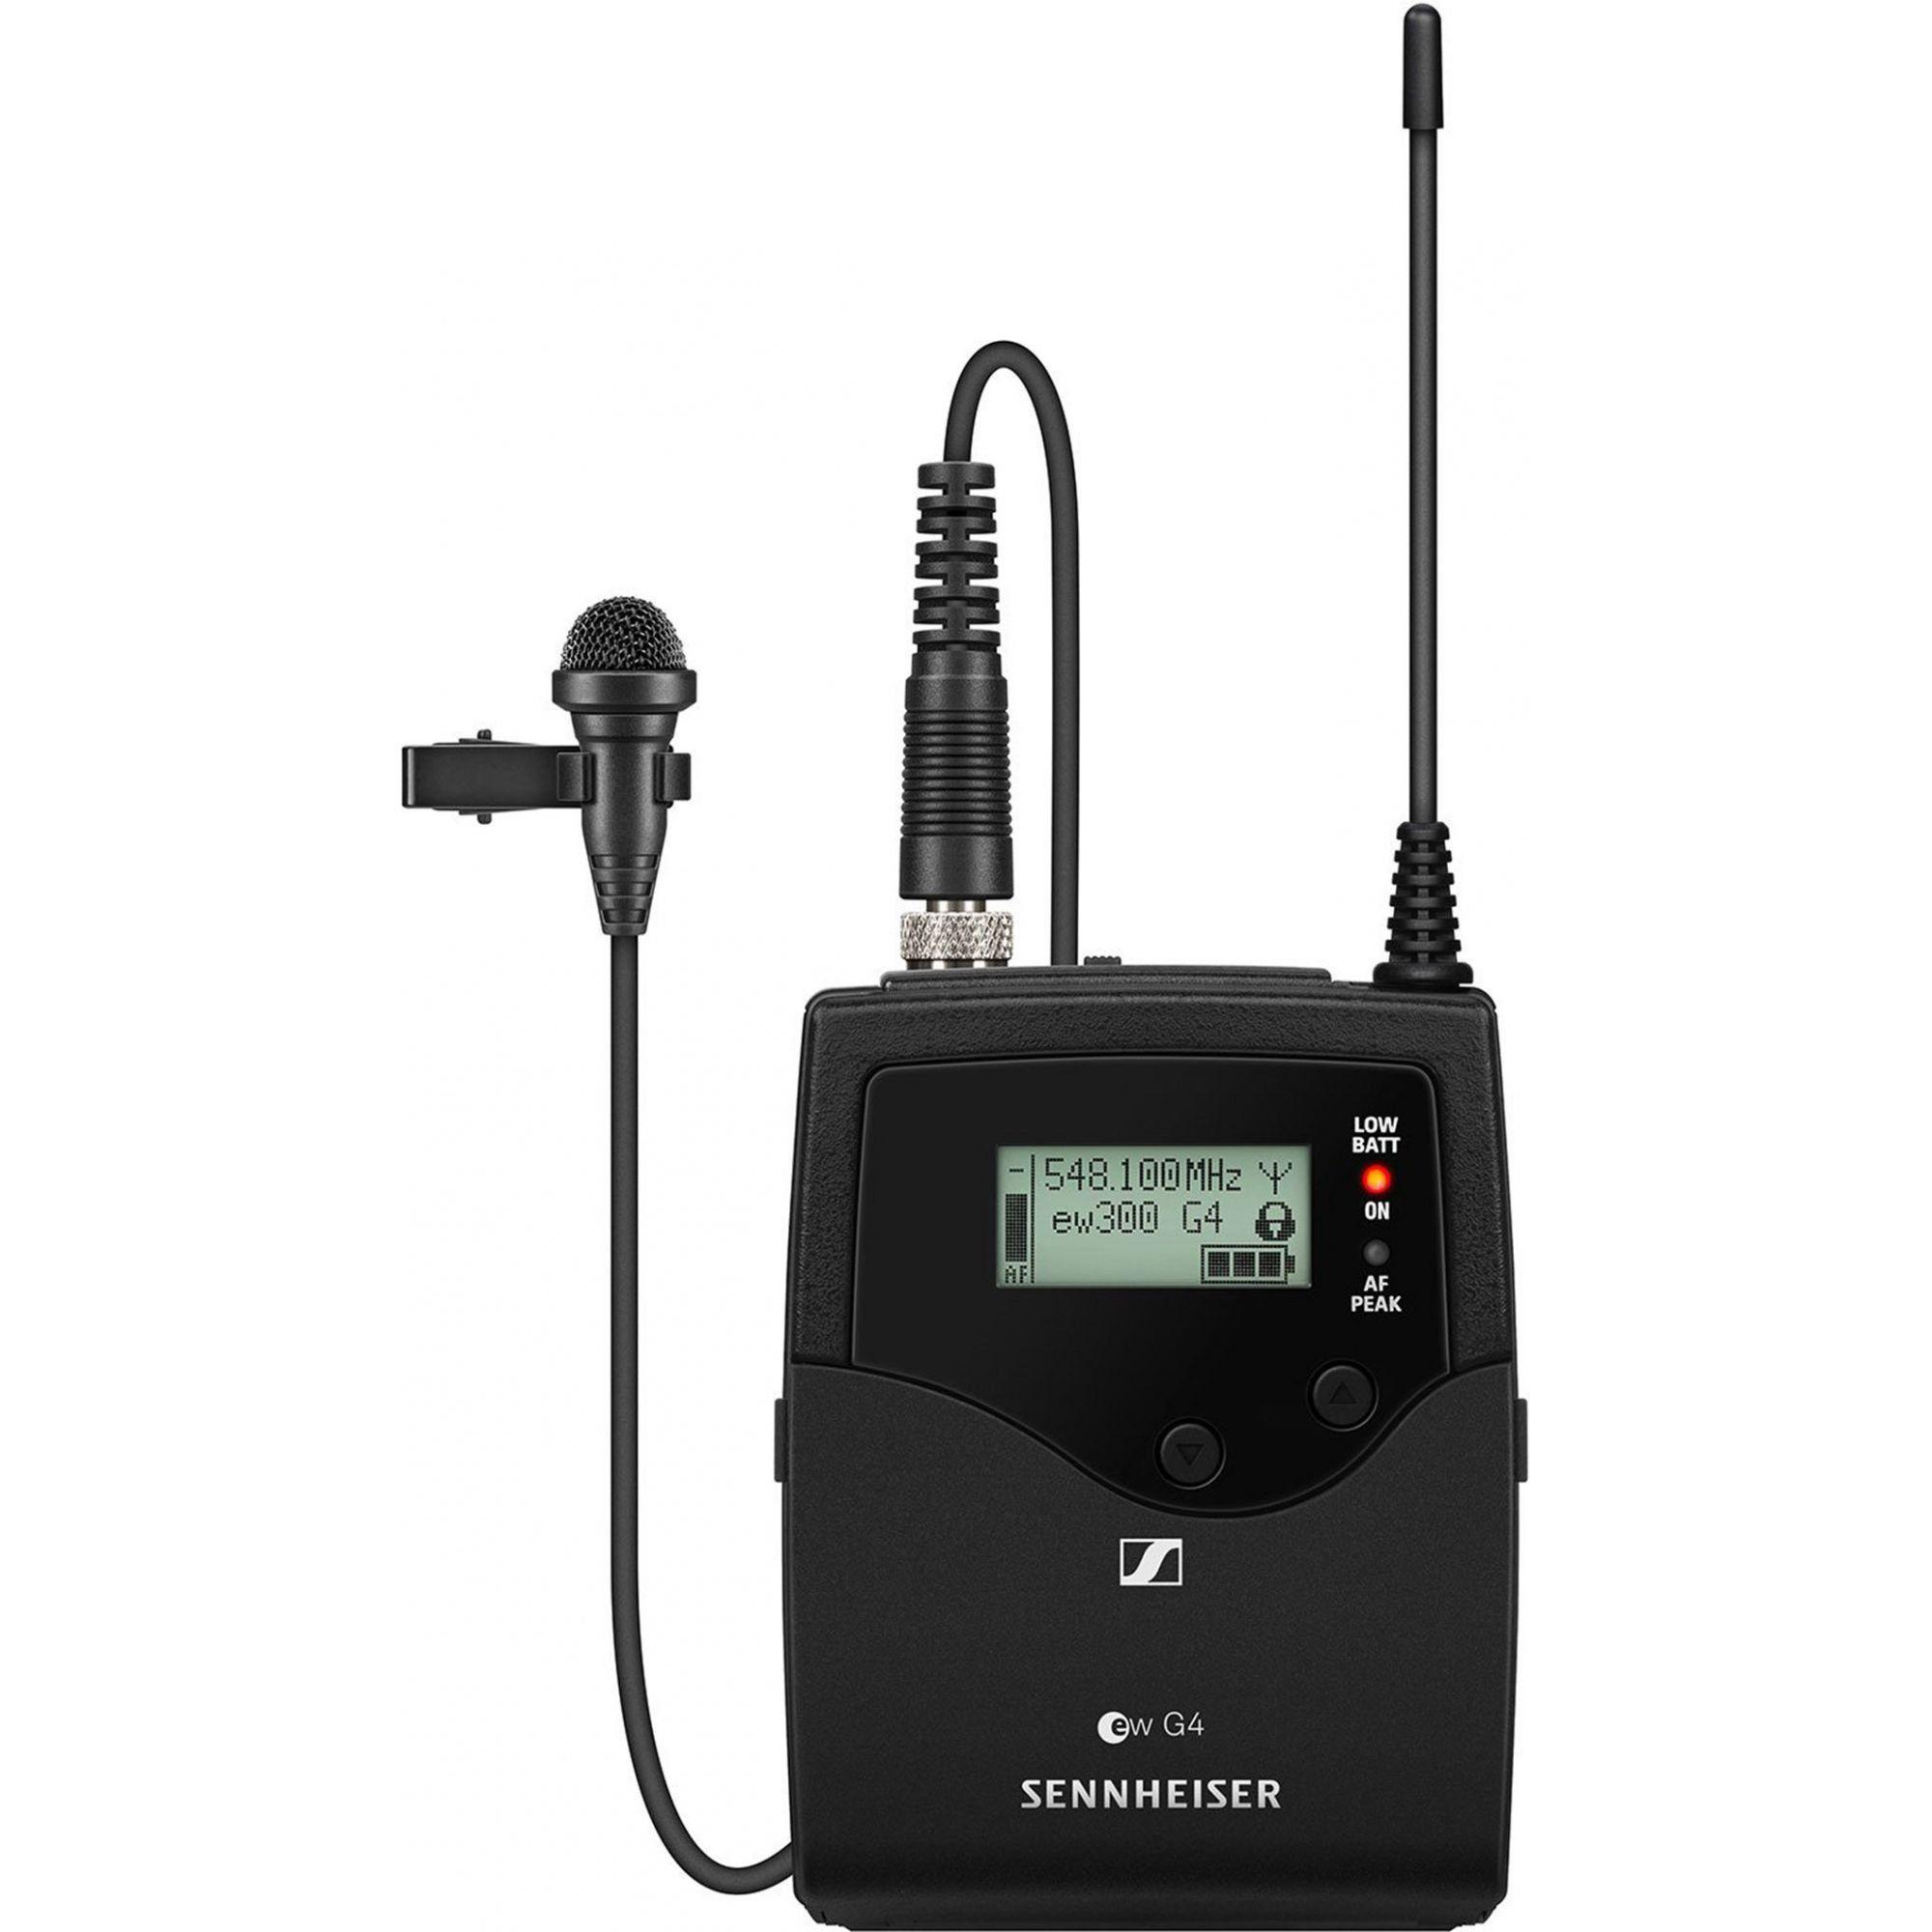 Sennheiser SK 300 G4-RC Transmissor sem fio para microfones SK 300 G4 RC